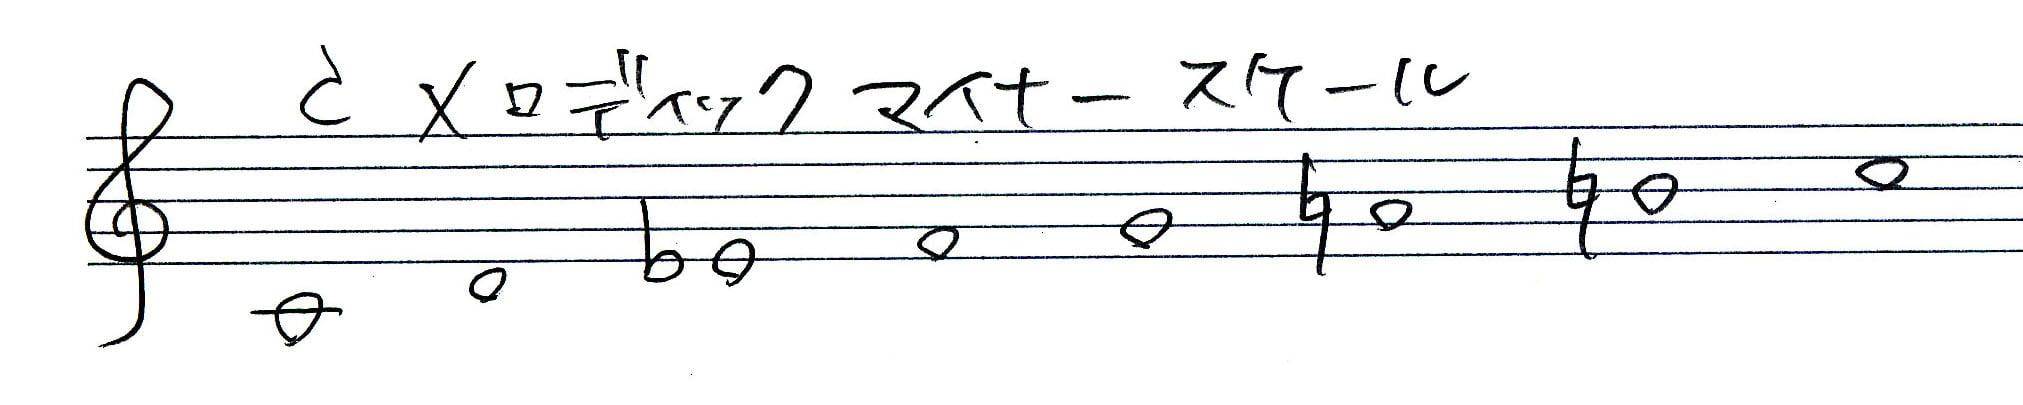 c-melodic-minor